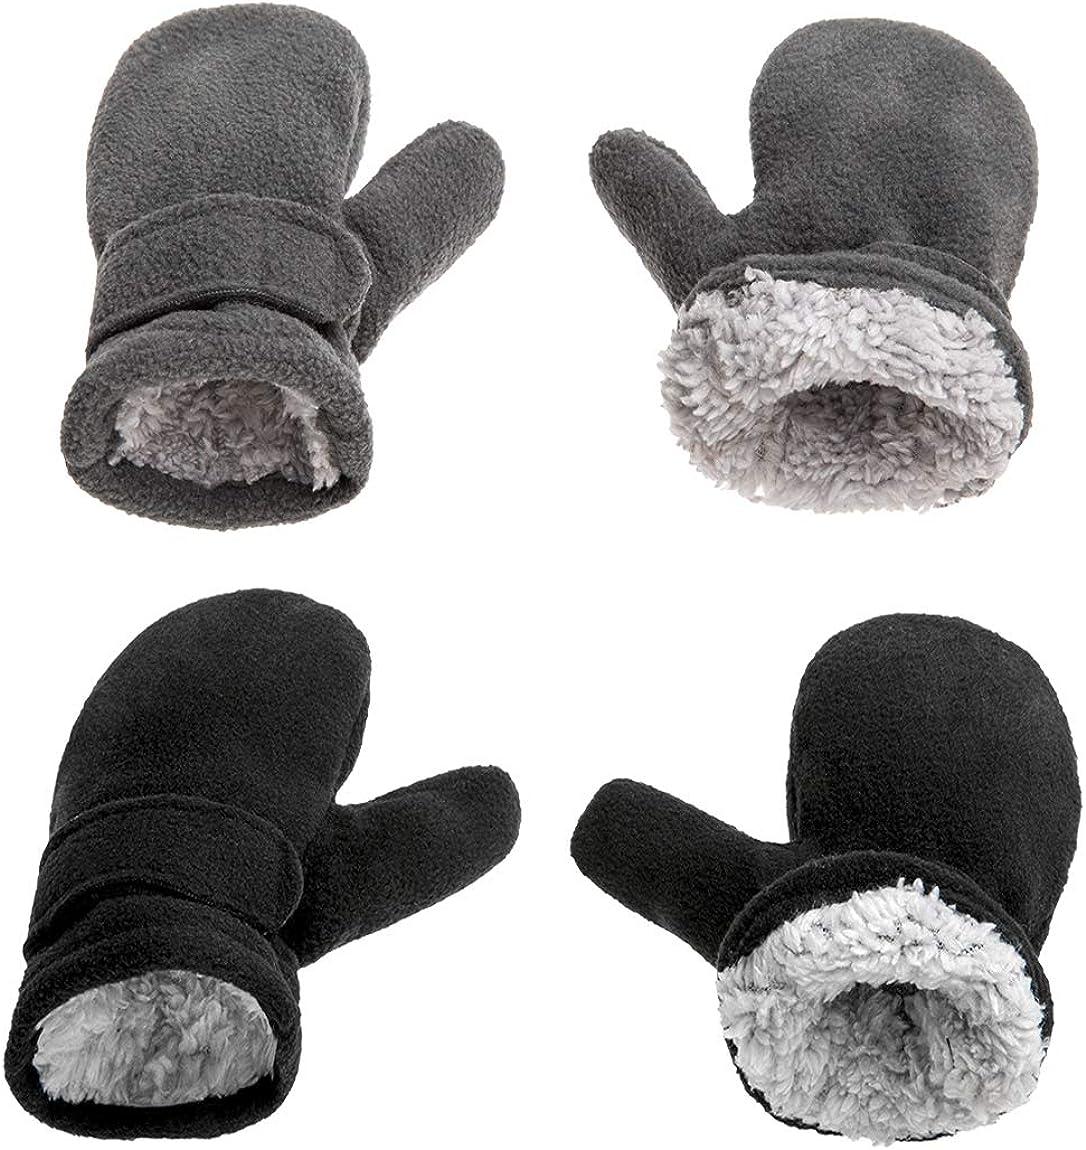 Fleece Lined Mittens for Baby Boys Girls,Baby Toddler Little Kids Winter Gloves Mittens - 2 Pair Pack